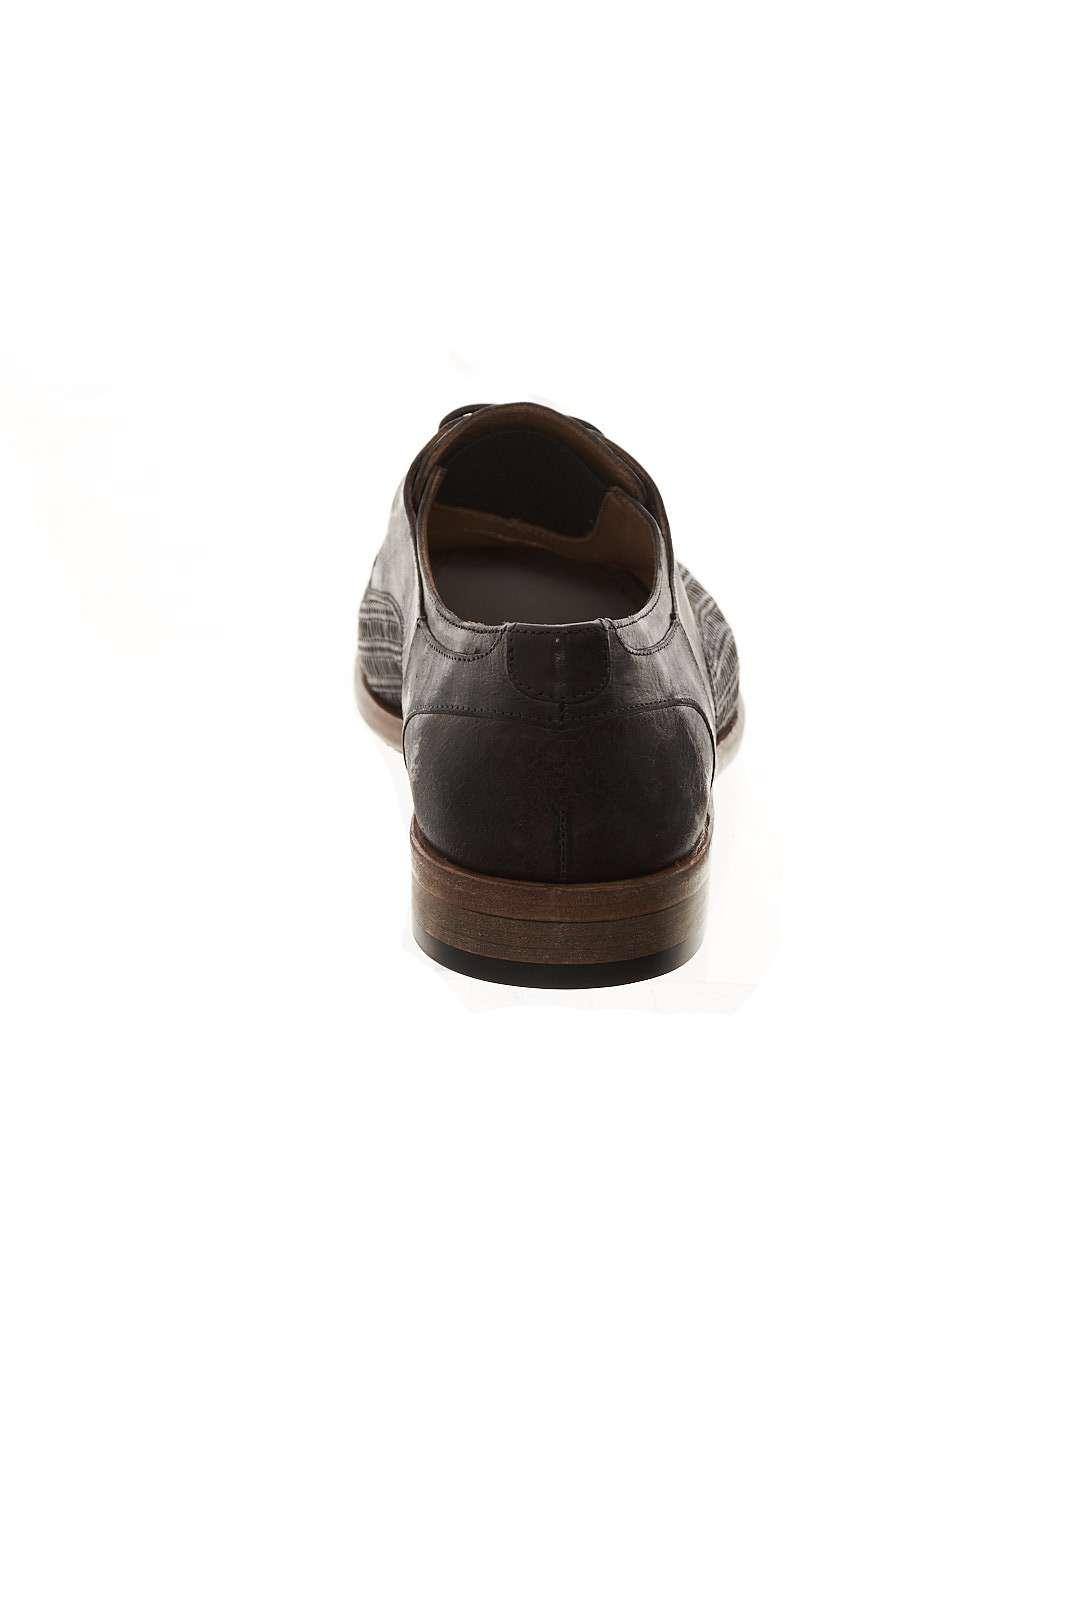 PE-outlet_parmax-scarpe-uomo-Corvari-8064